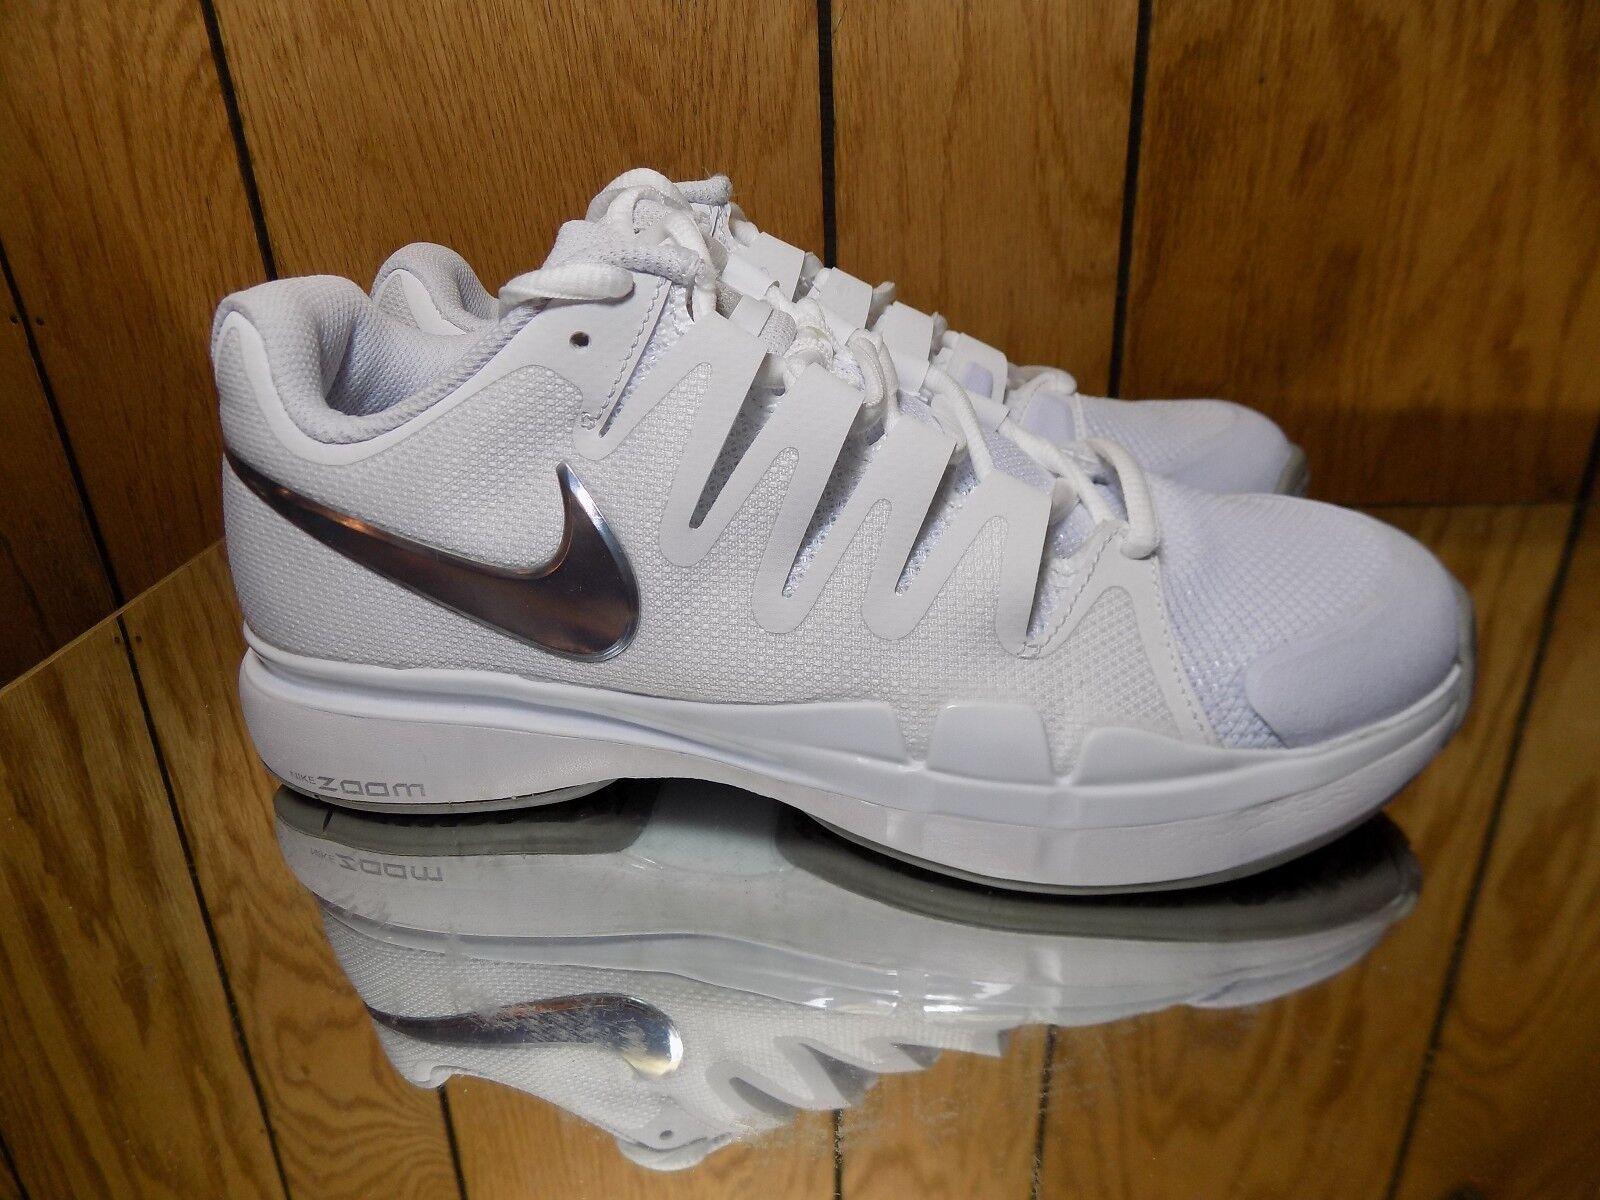 Nike Women Zoom Vapor Tour Tennis Shoe White/Silver 631475-101 s 6.5